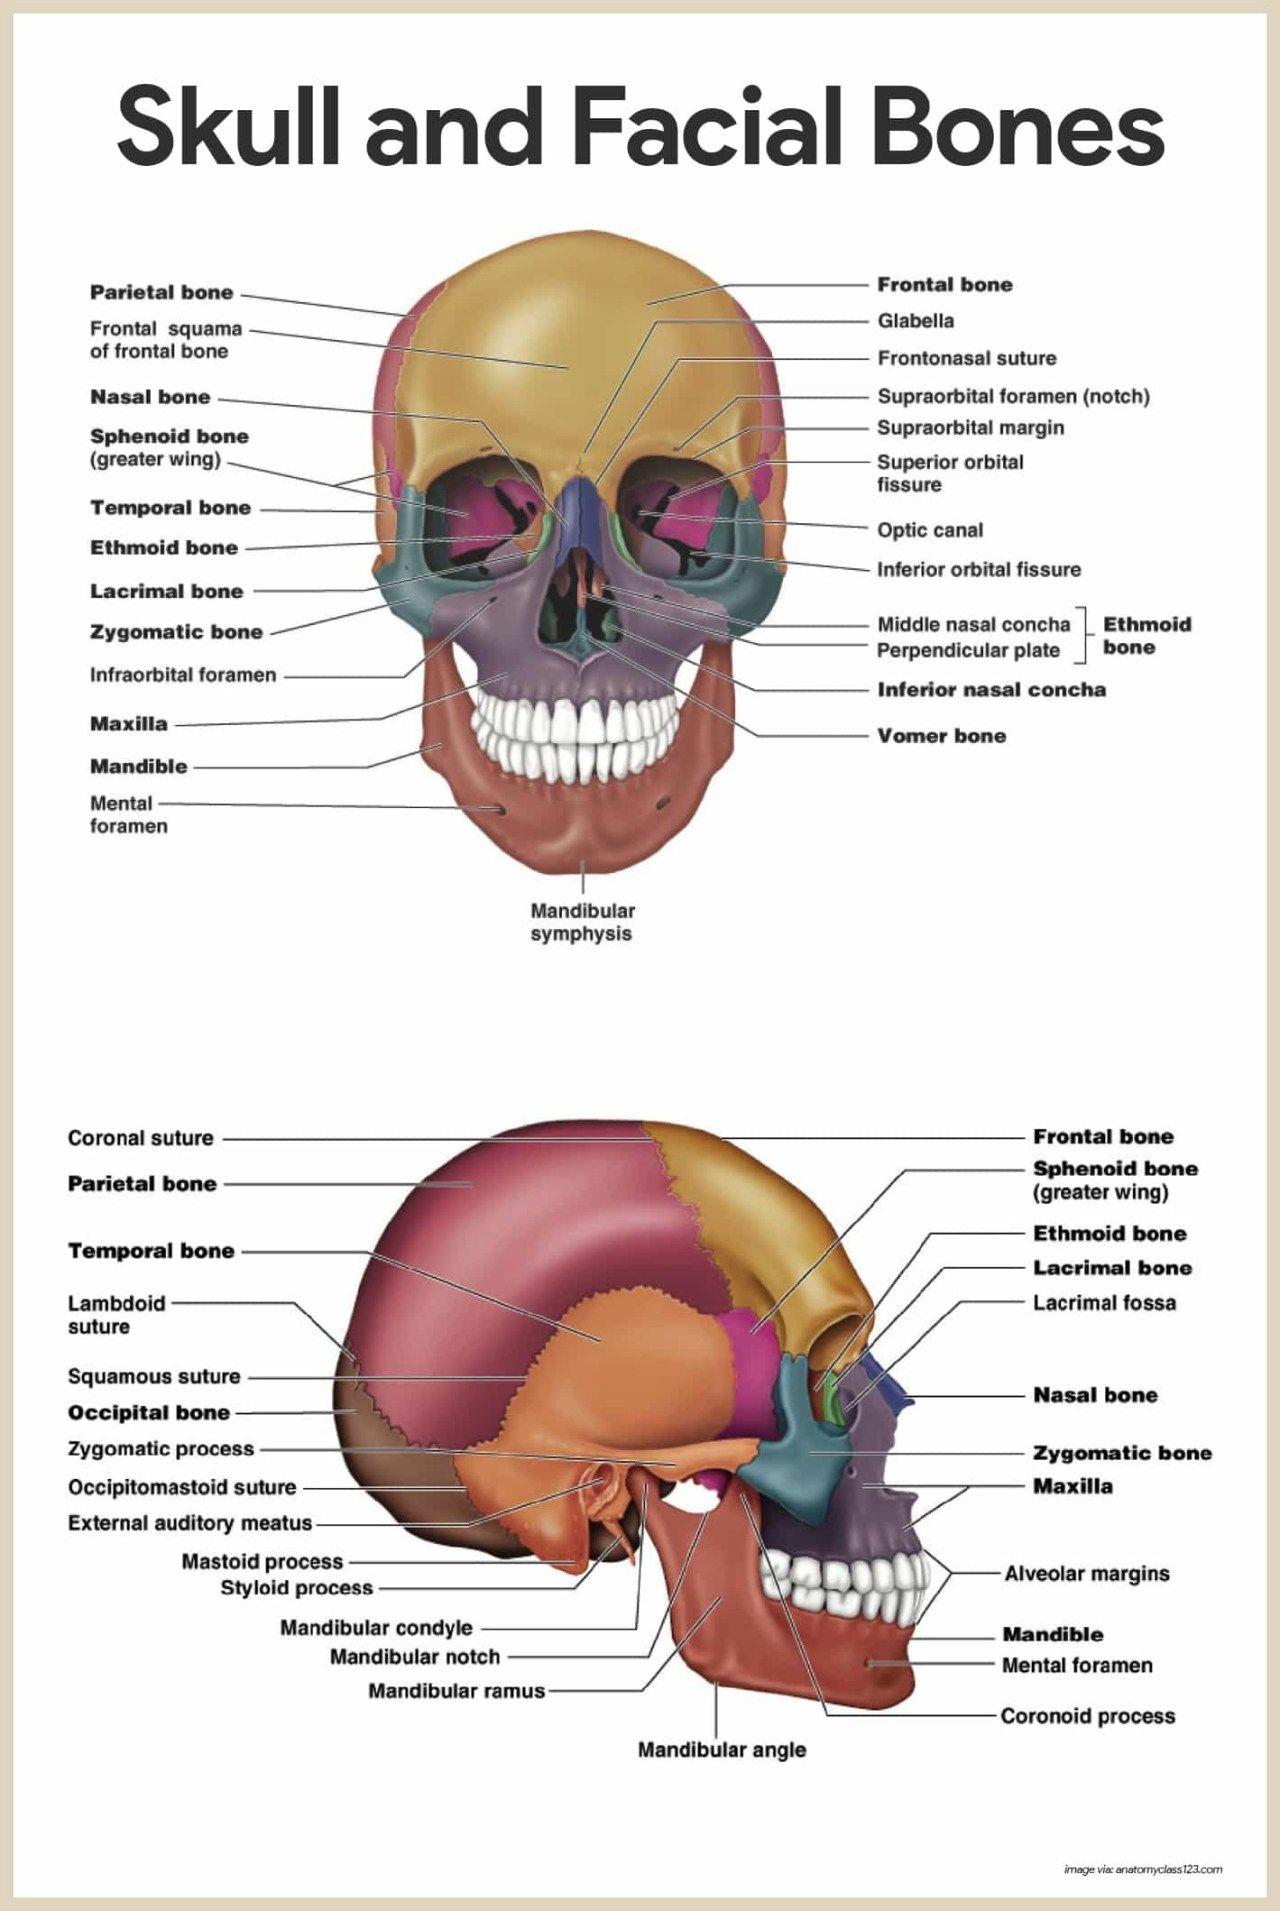 medium resolution of anatomy bones learning skeletal system anatomy and physiology nurseslabs